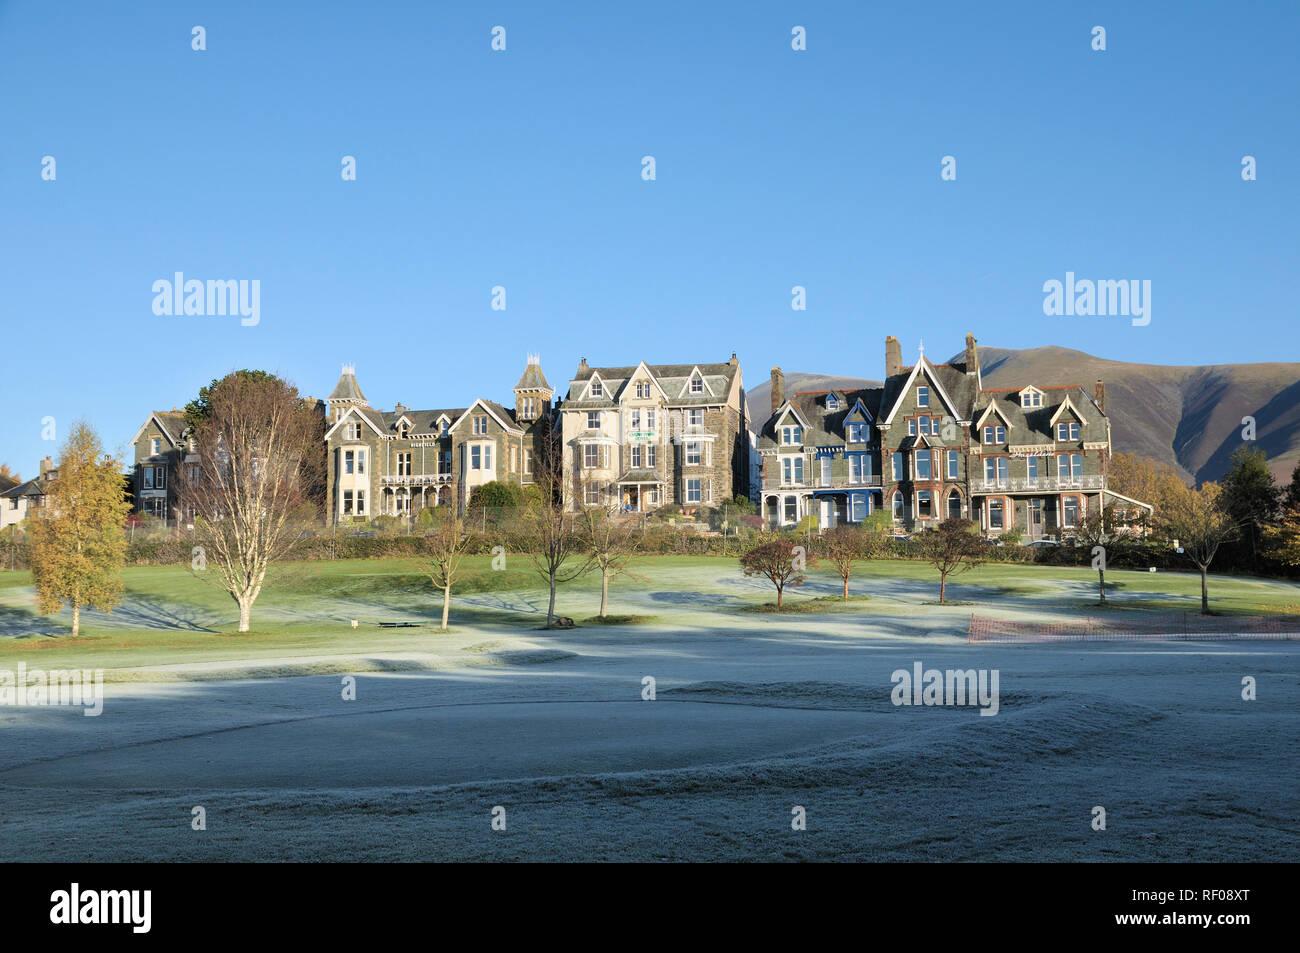 Hotels and B&B accommodation overlooking Hope Park, Keswick, Lake District, Cumbria, England, UK - Stock Image